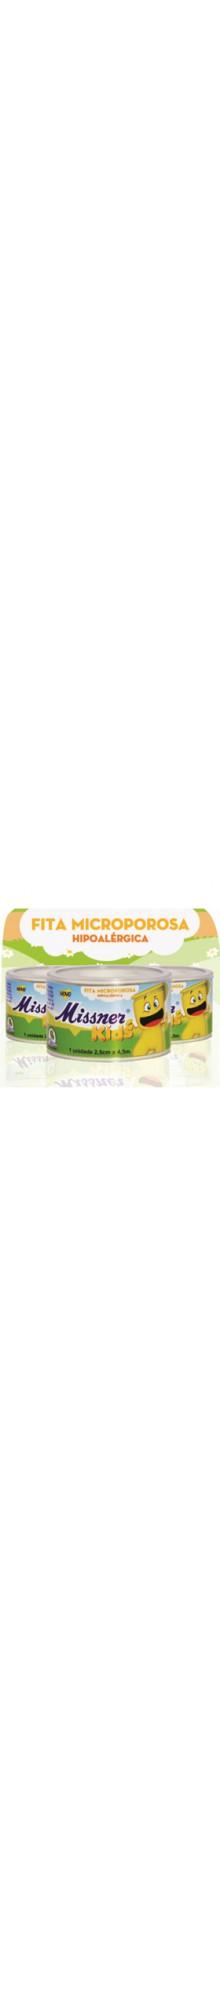 Fita Microporosa Hipoalérgica Kids